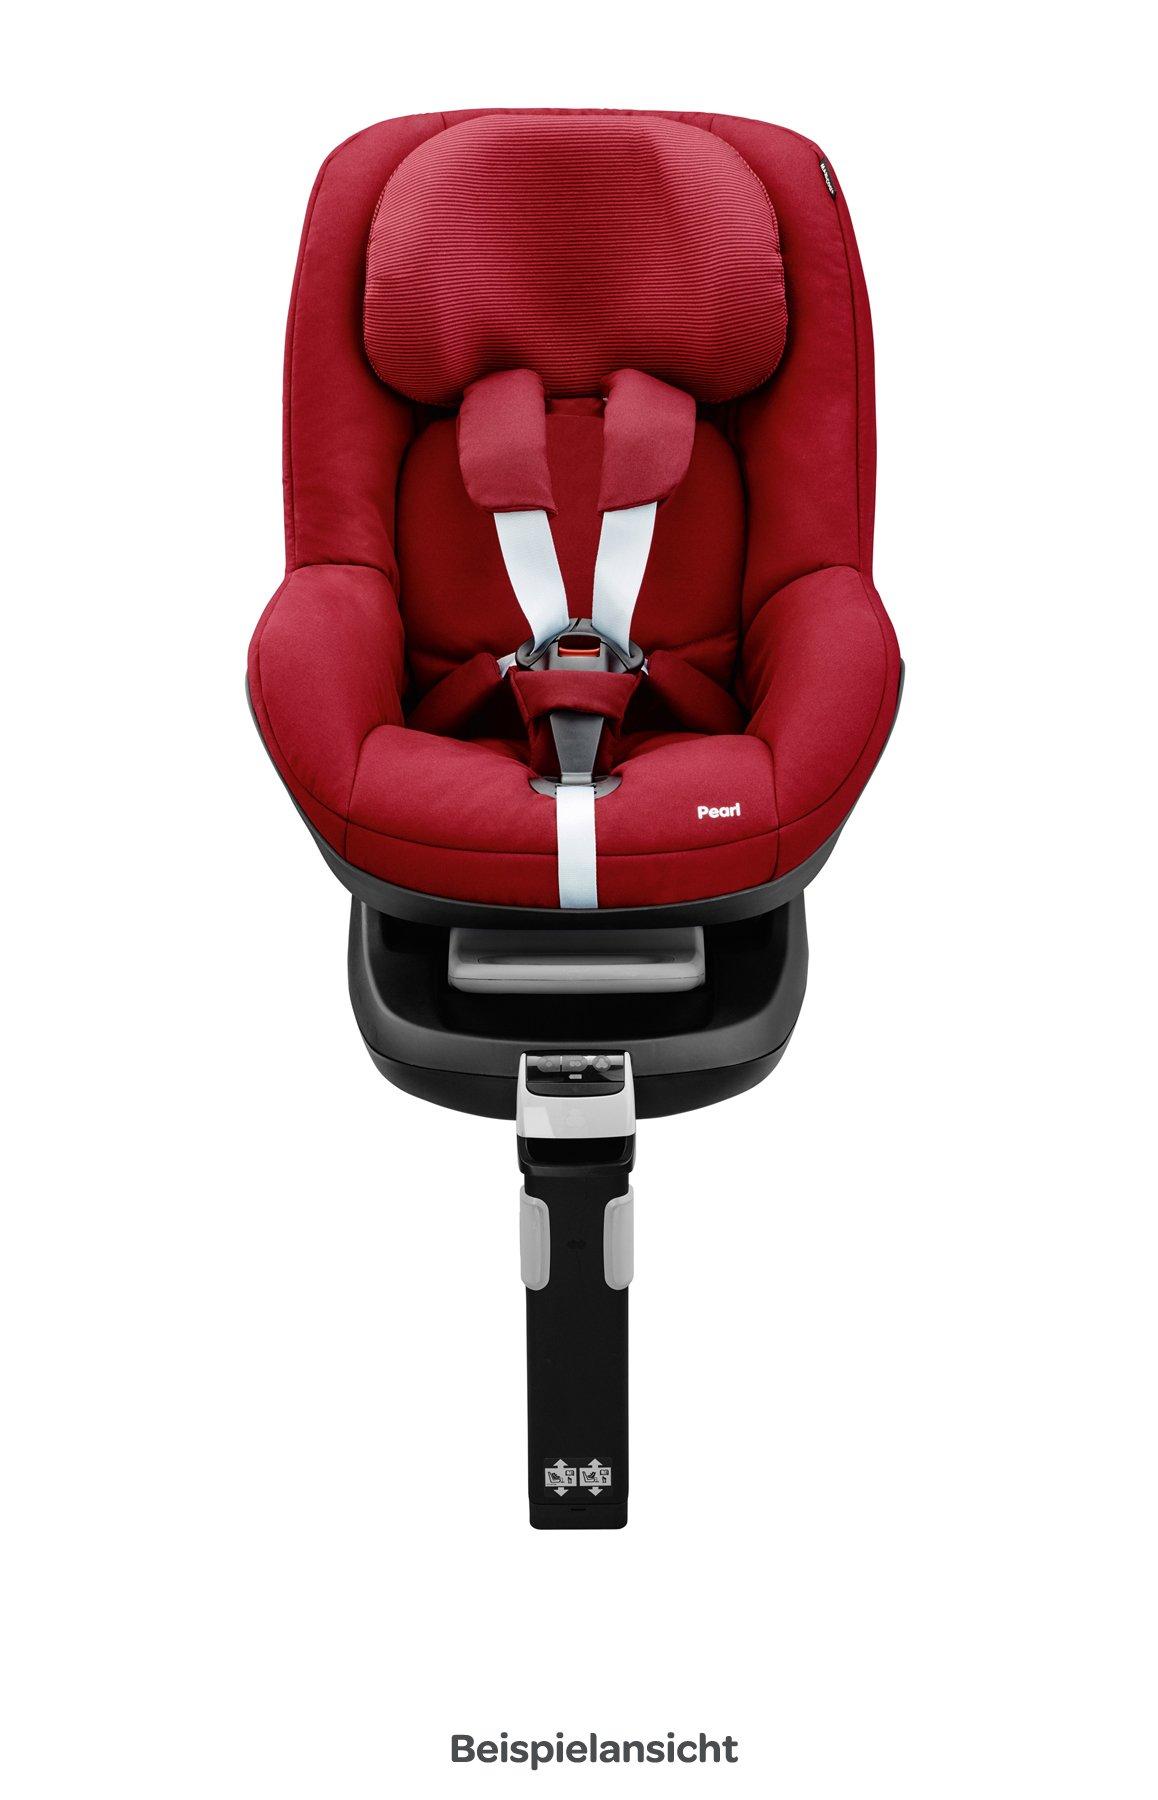 Maxi-Cosi 63409641Pearl Children's Seat, Group 1, 9-18kg Maxi-Cosi  17